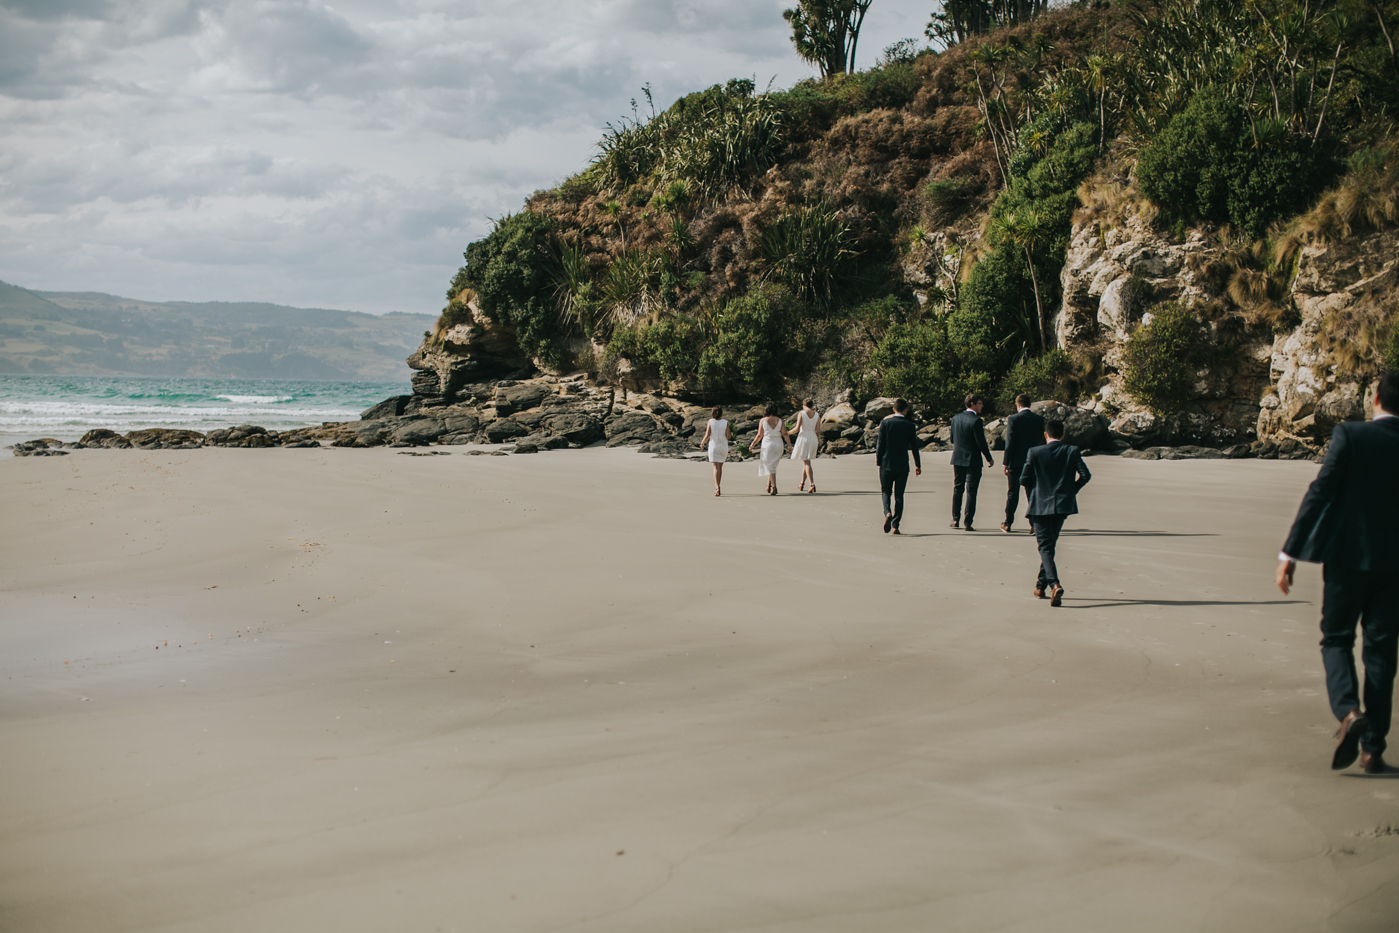 Ariana & Tim - Dunedin, New Zealand Wedding - Destination Wedding - Samantha Heather Photography-117.jpg